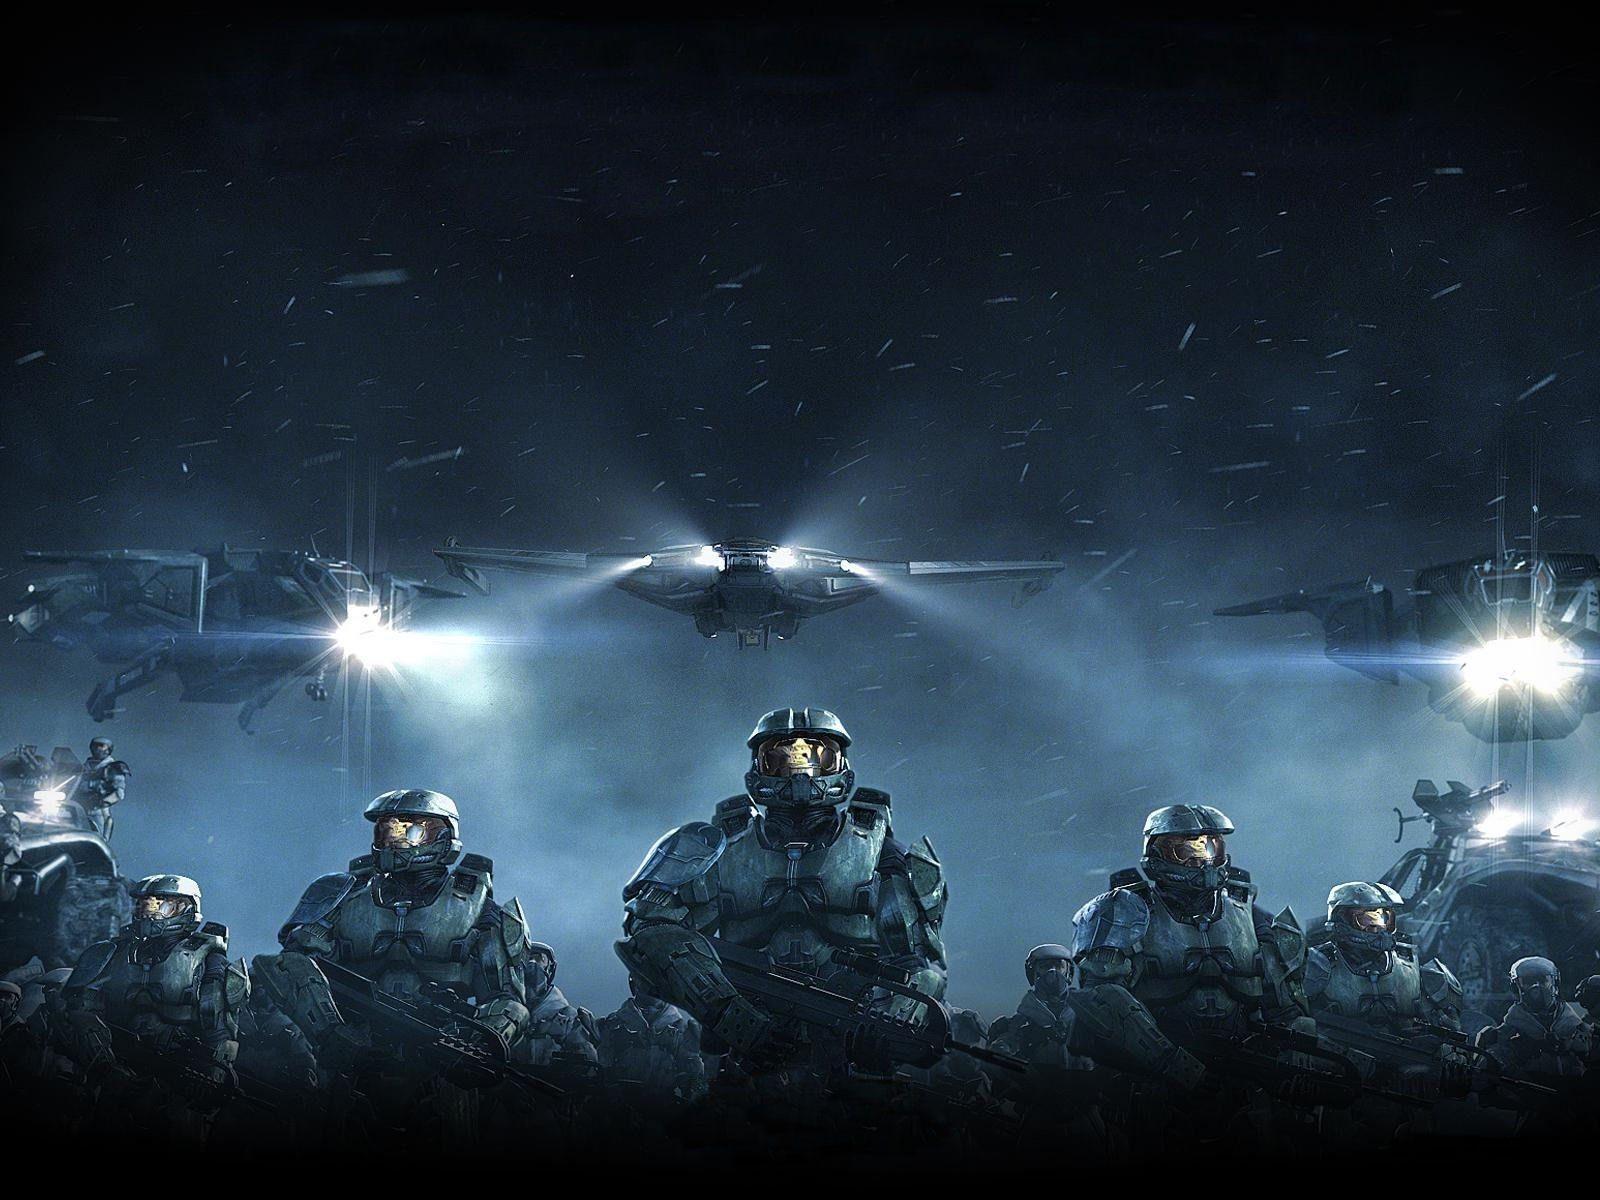 Halo Desktop Backgrounds 1600x1200